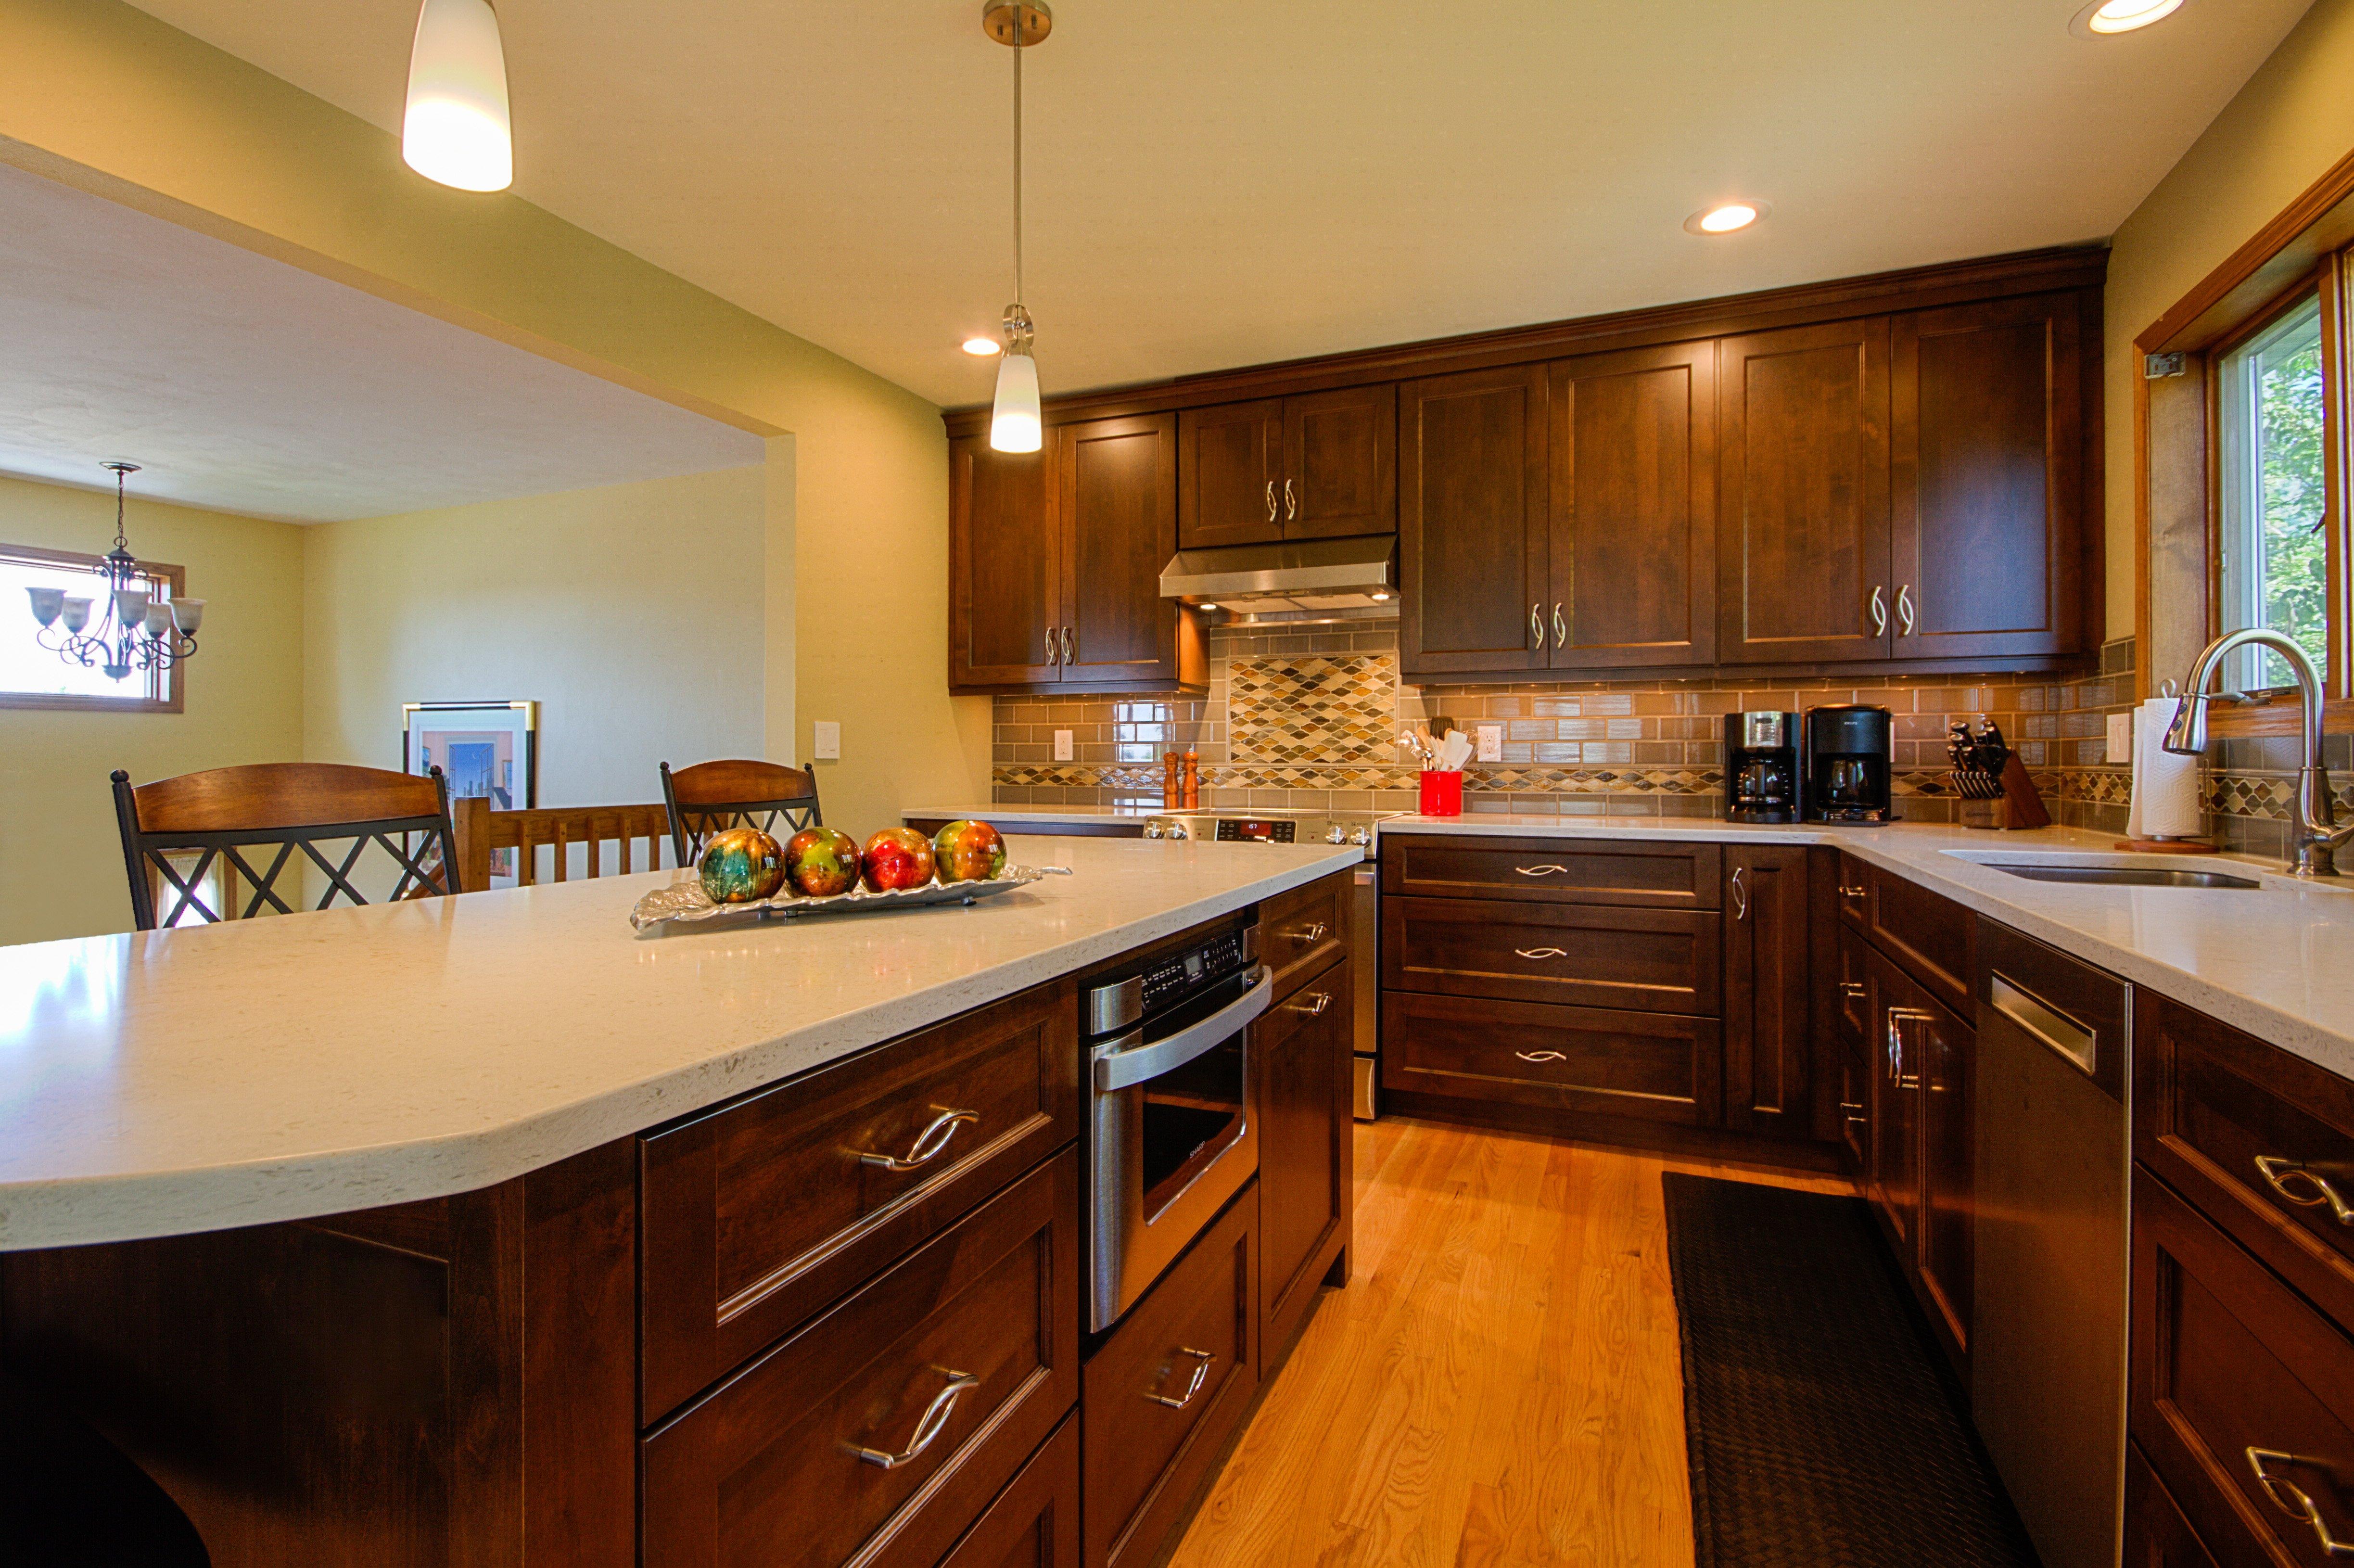 Kitchen Remodeling and Design, l-shape kitchen layout, dark brown kitchen cabinets